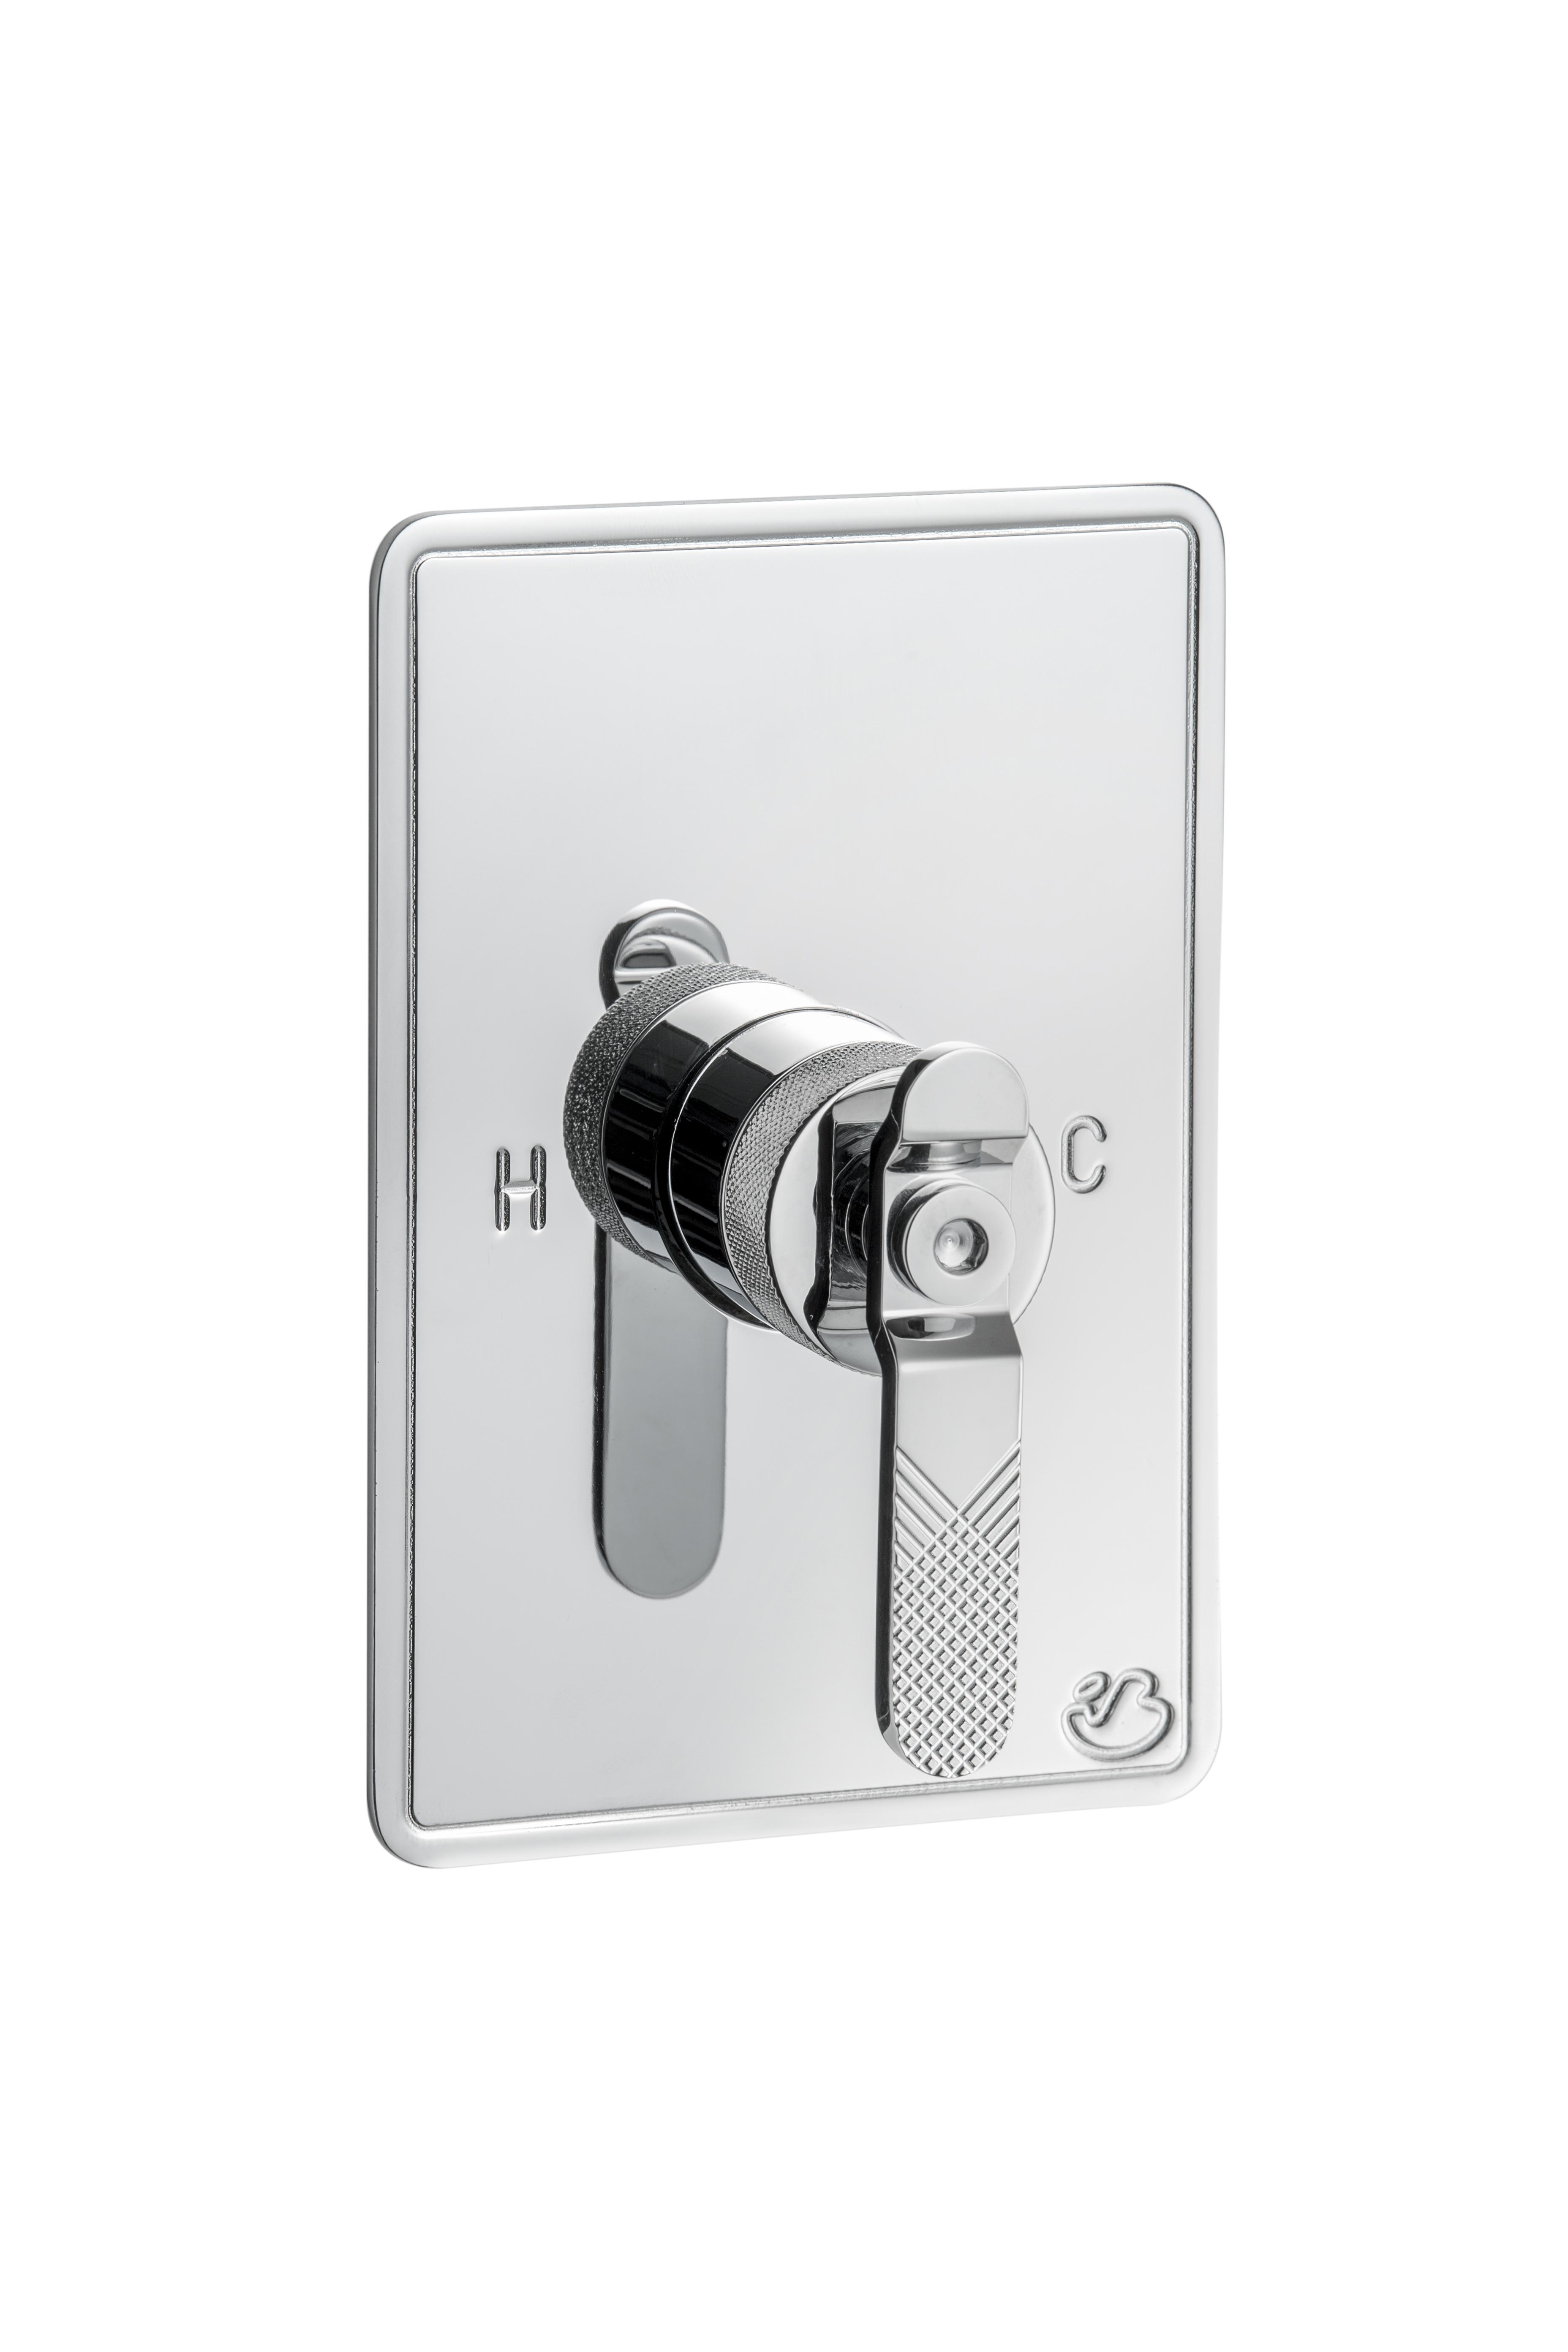 KB2300 Bold Lever shower mixer